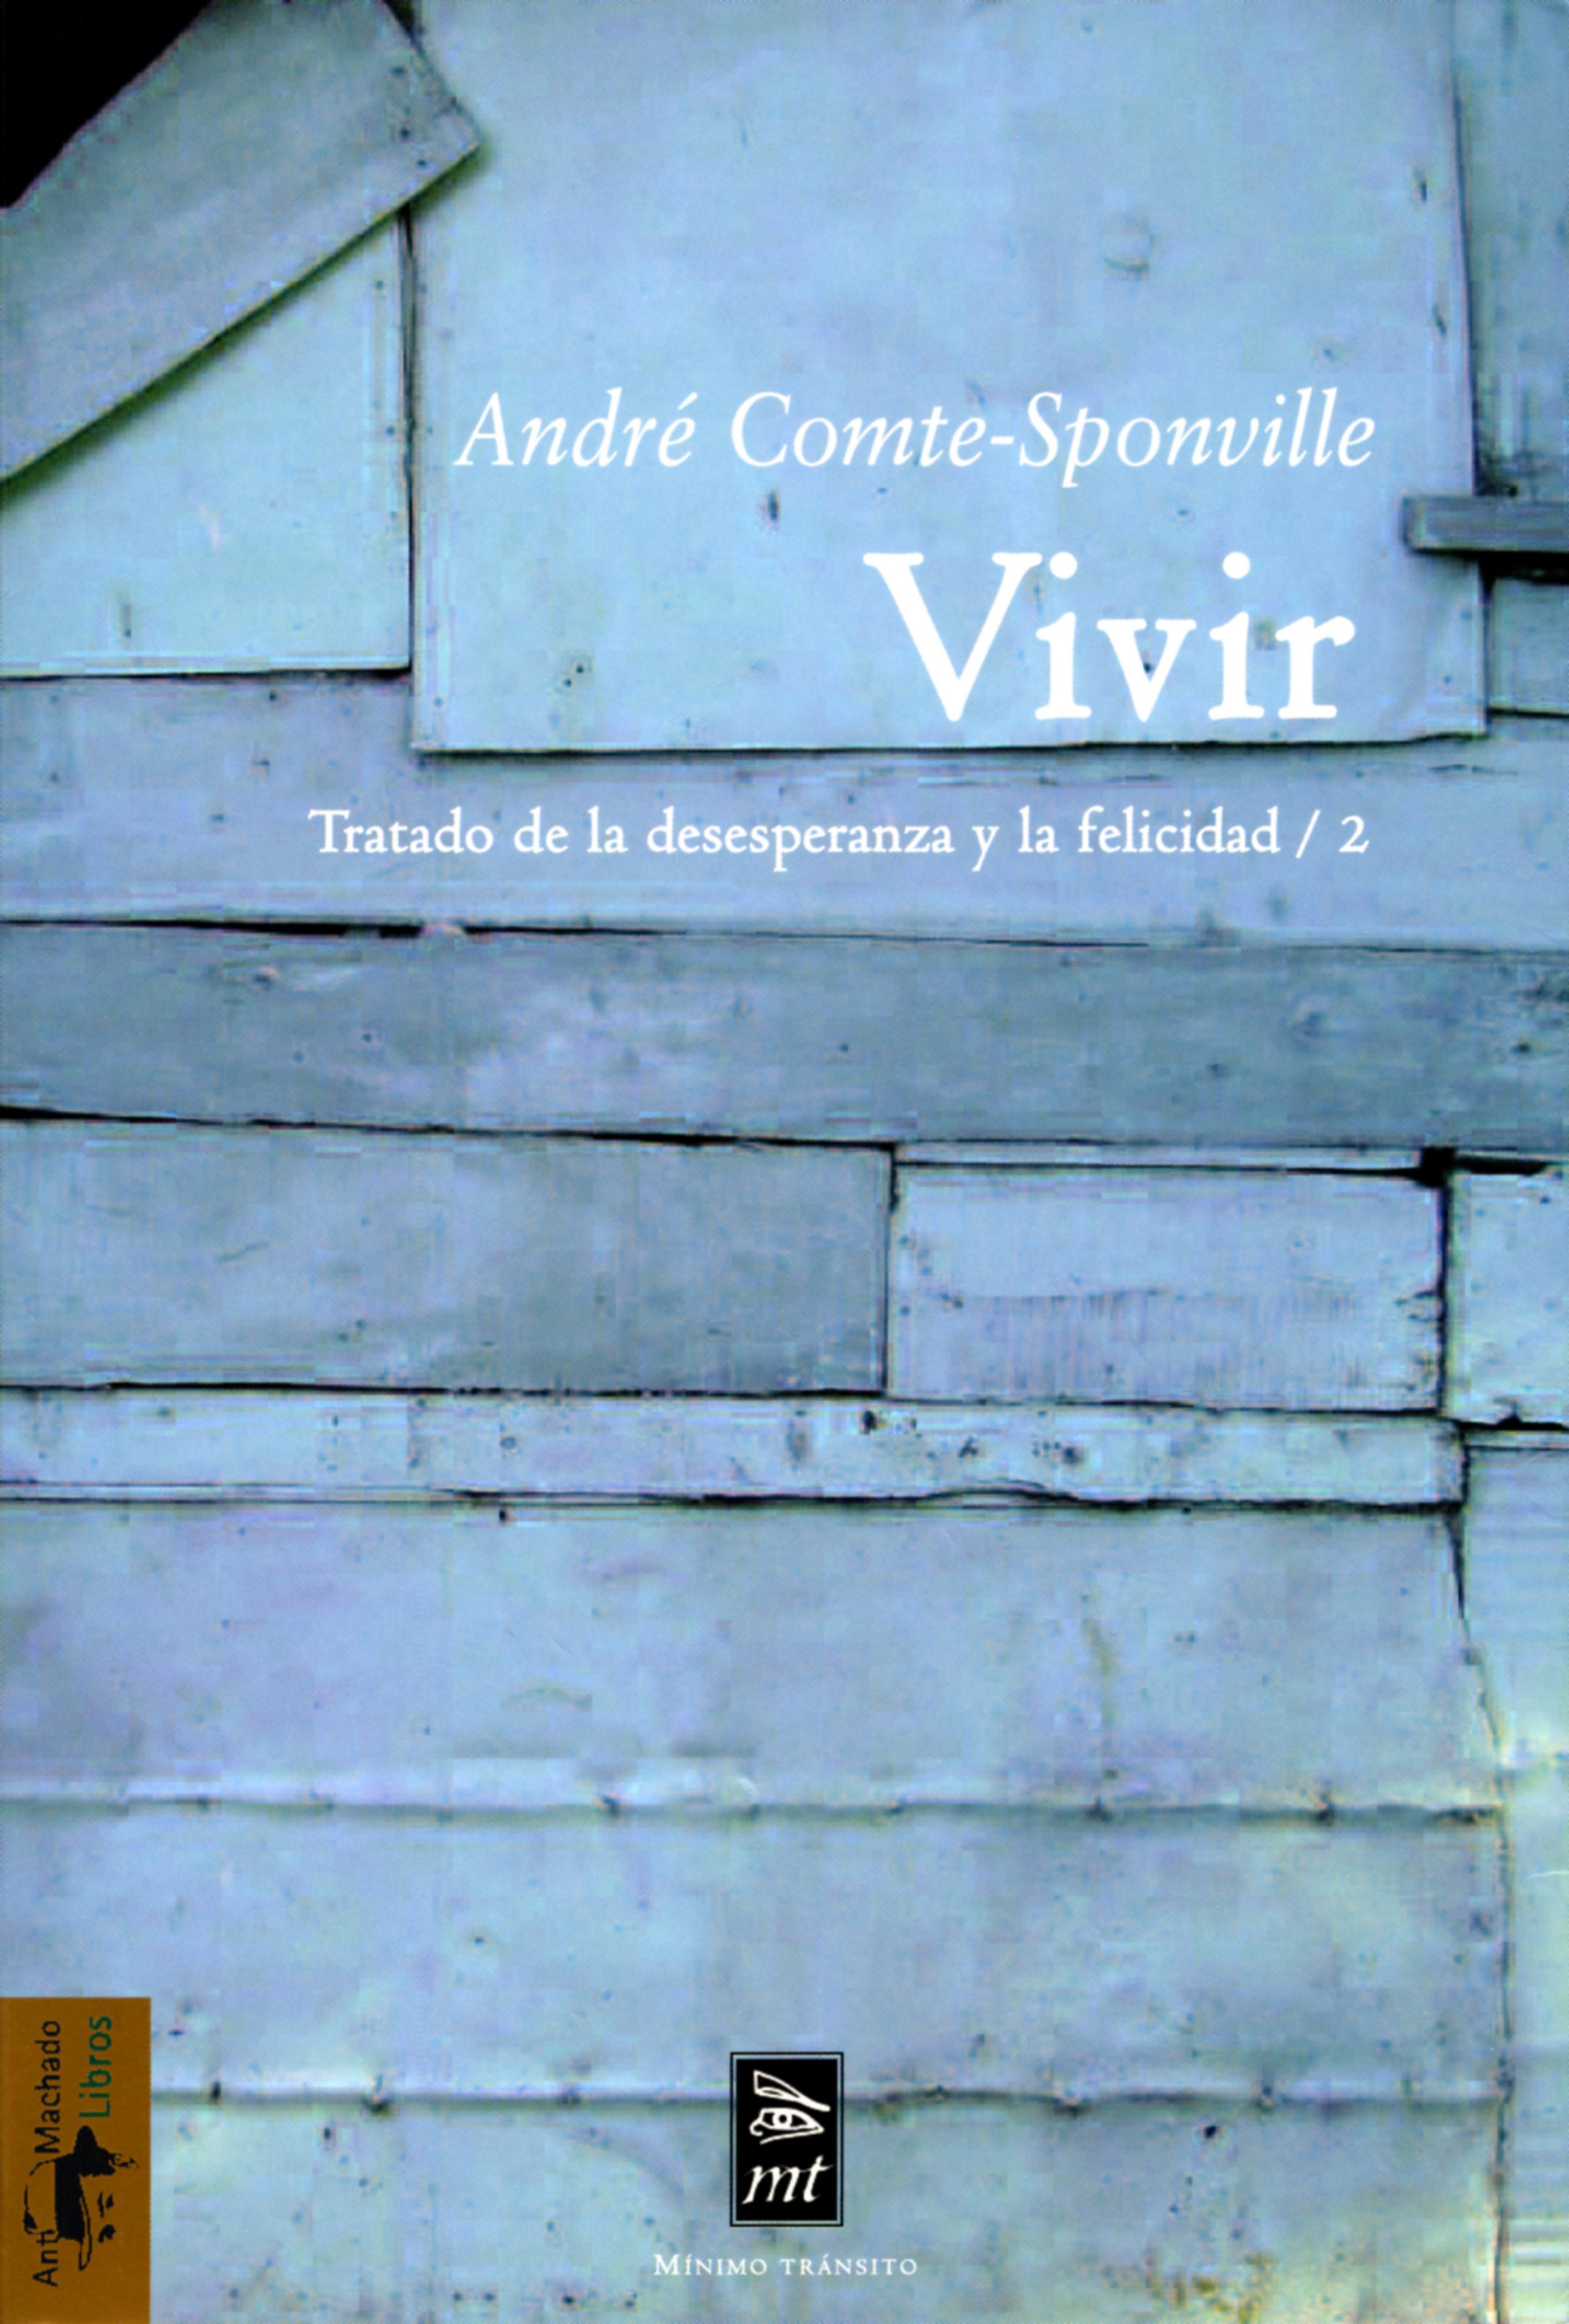 Andre Comte-Sponville Vivir vivir adrede